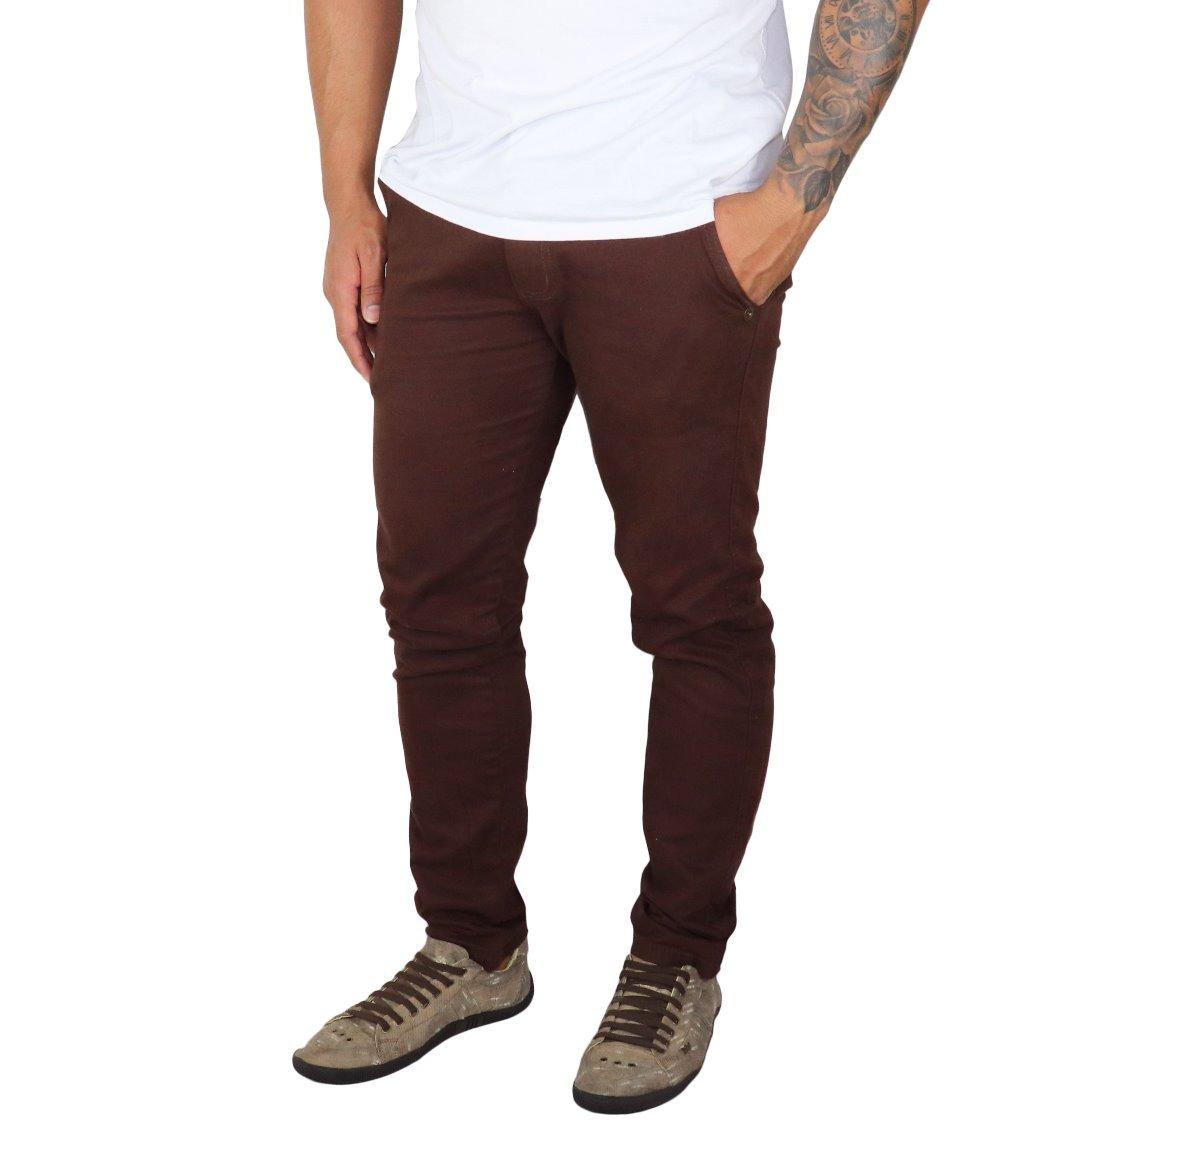 1d14763f2 Kit 3 Peças Calça Jeans Sarja Masculina Slim Skinny C Lycra - R$ 118 ...